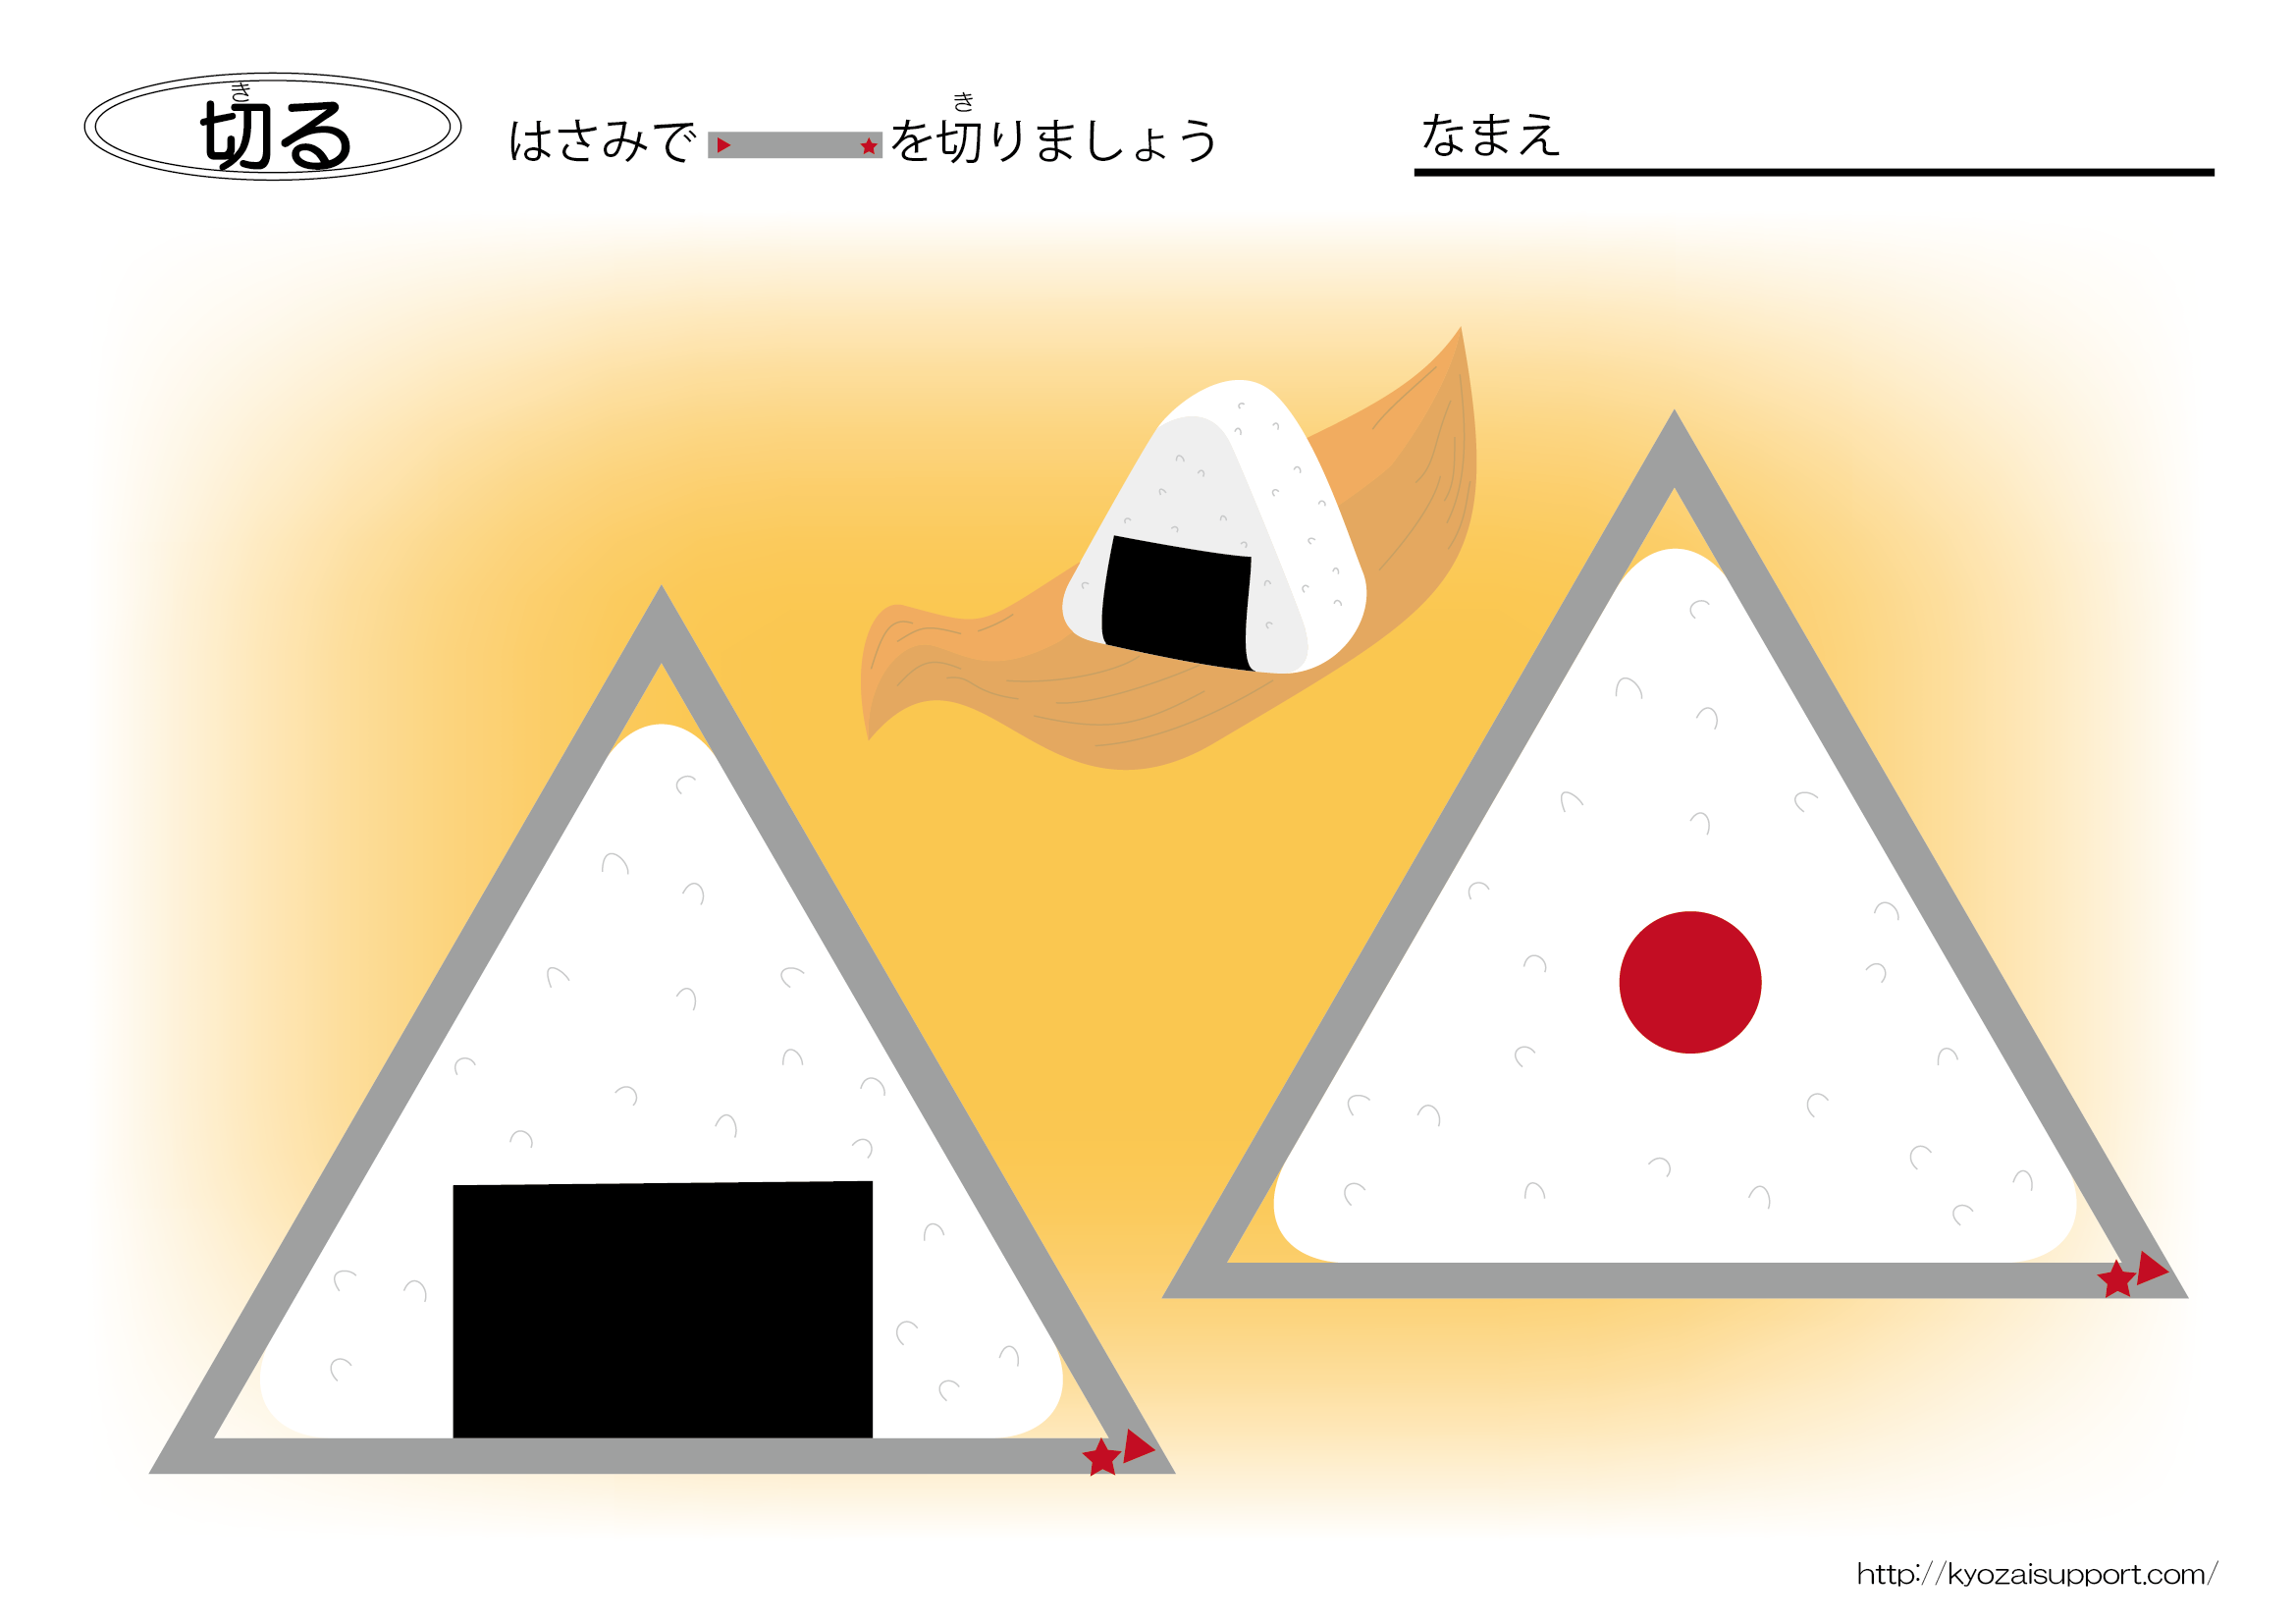 13-19 May 2013 : 幼児無料教材 : 幼児